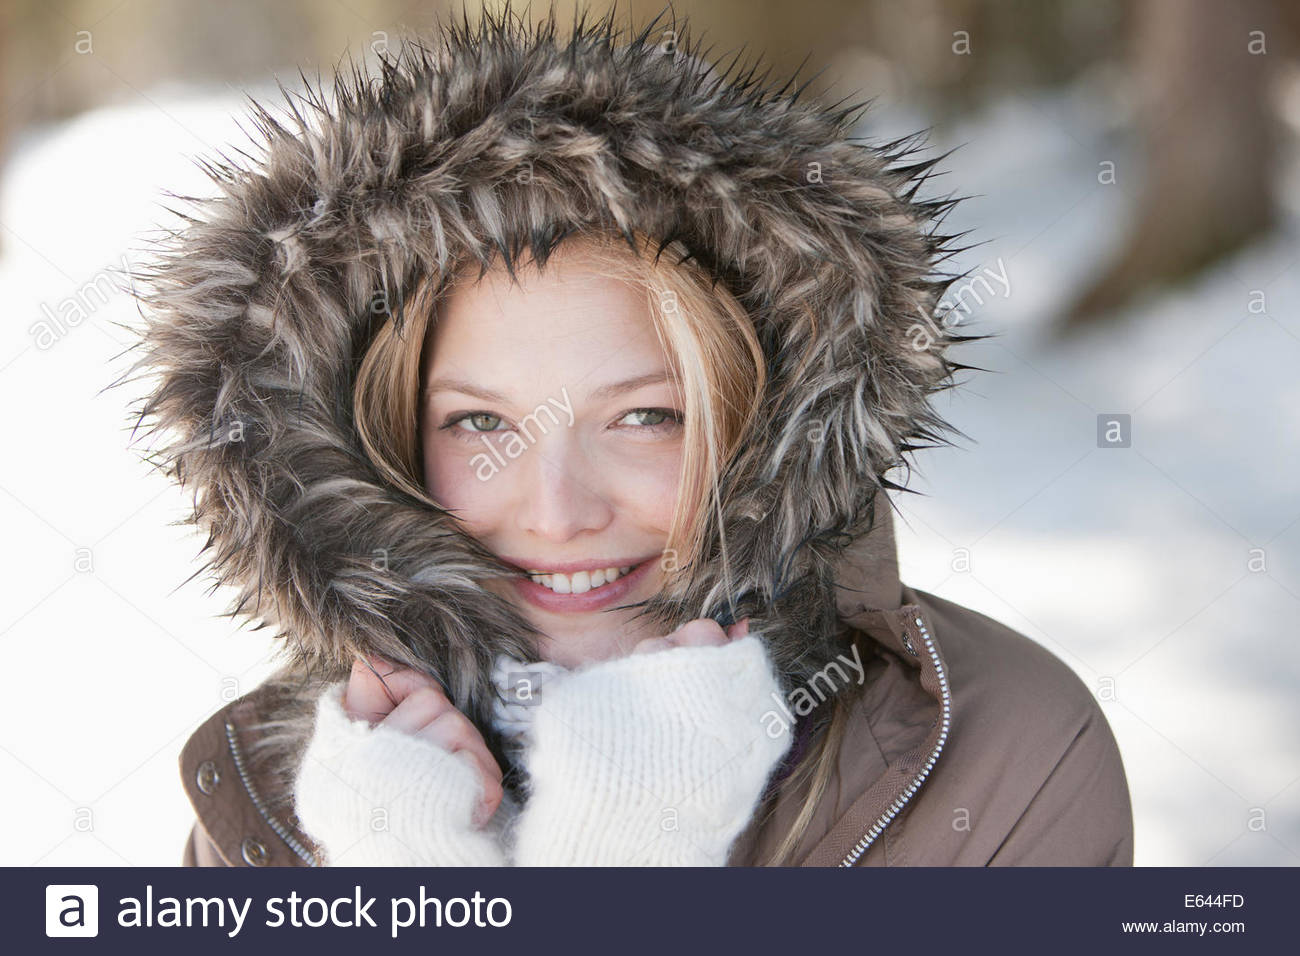 Portrait of smiling woman wearing fur hood coat - Stock Image